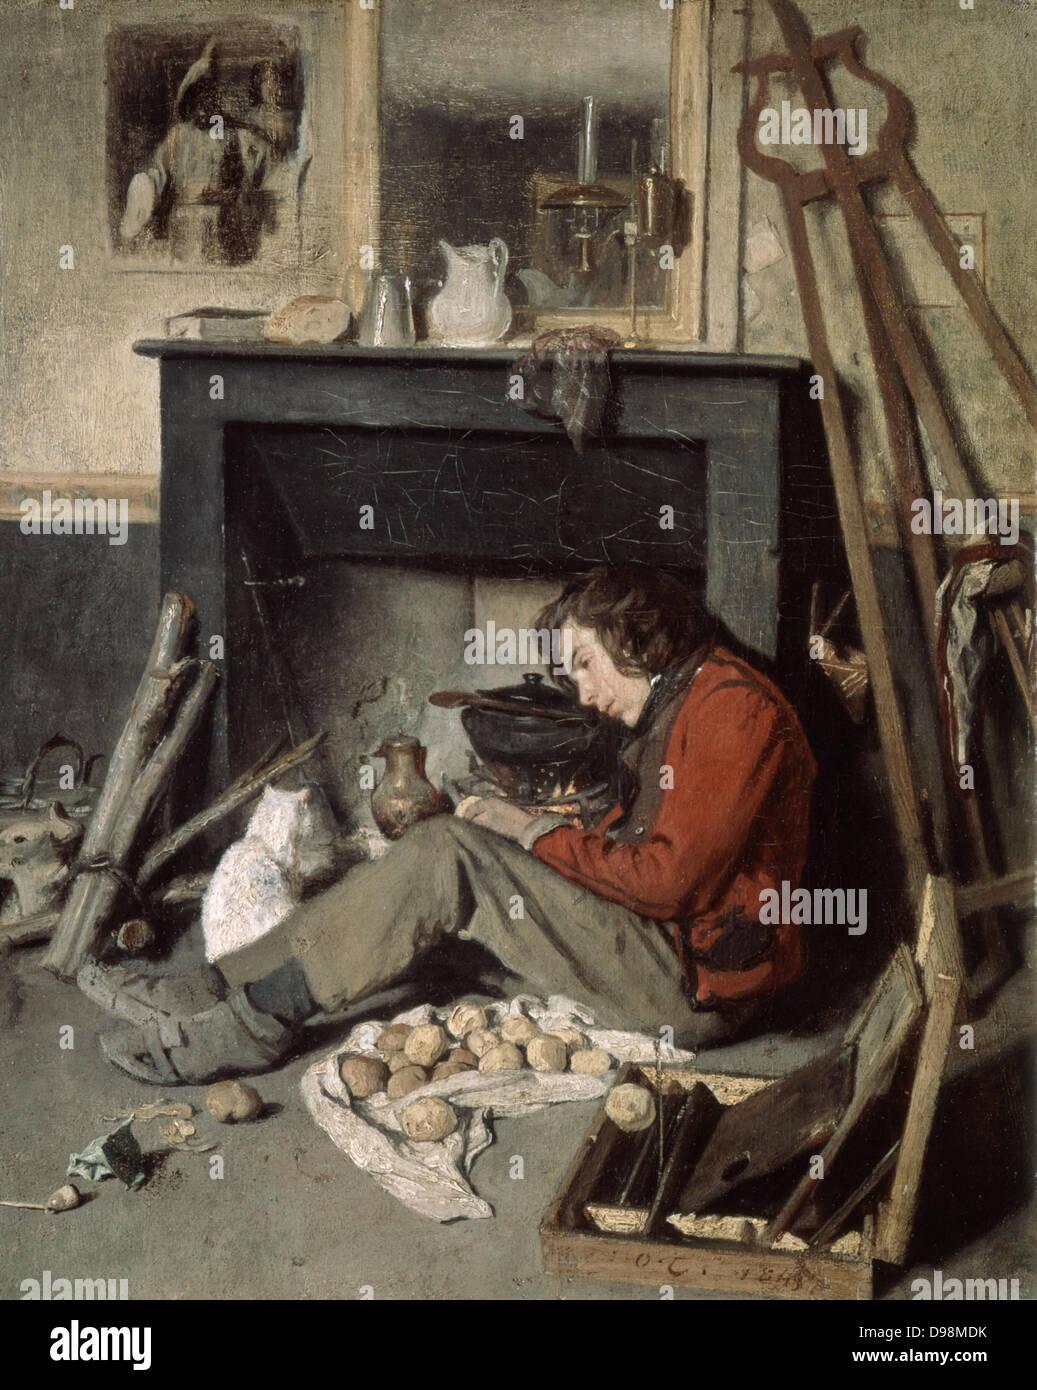 The Artist's Studio' 1845. Oil on canvas. Octave Tassaert (1800-1874) French genre and portrait painter. - Stock Image